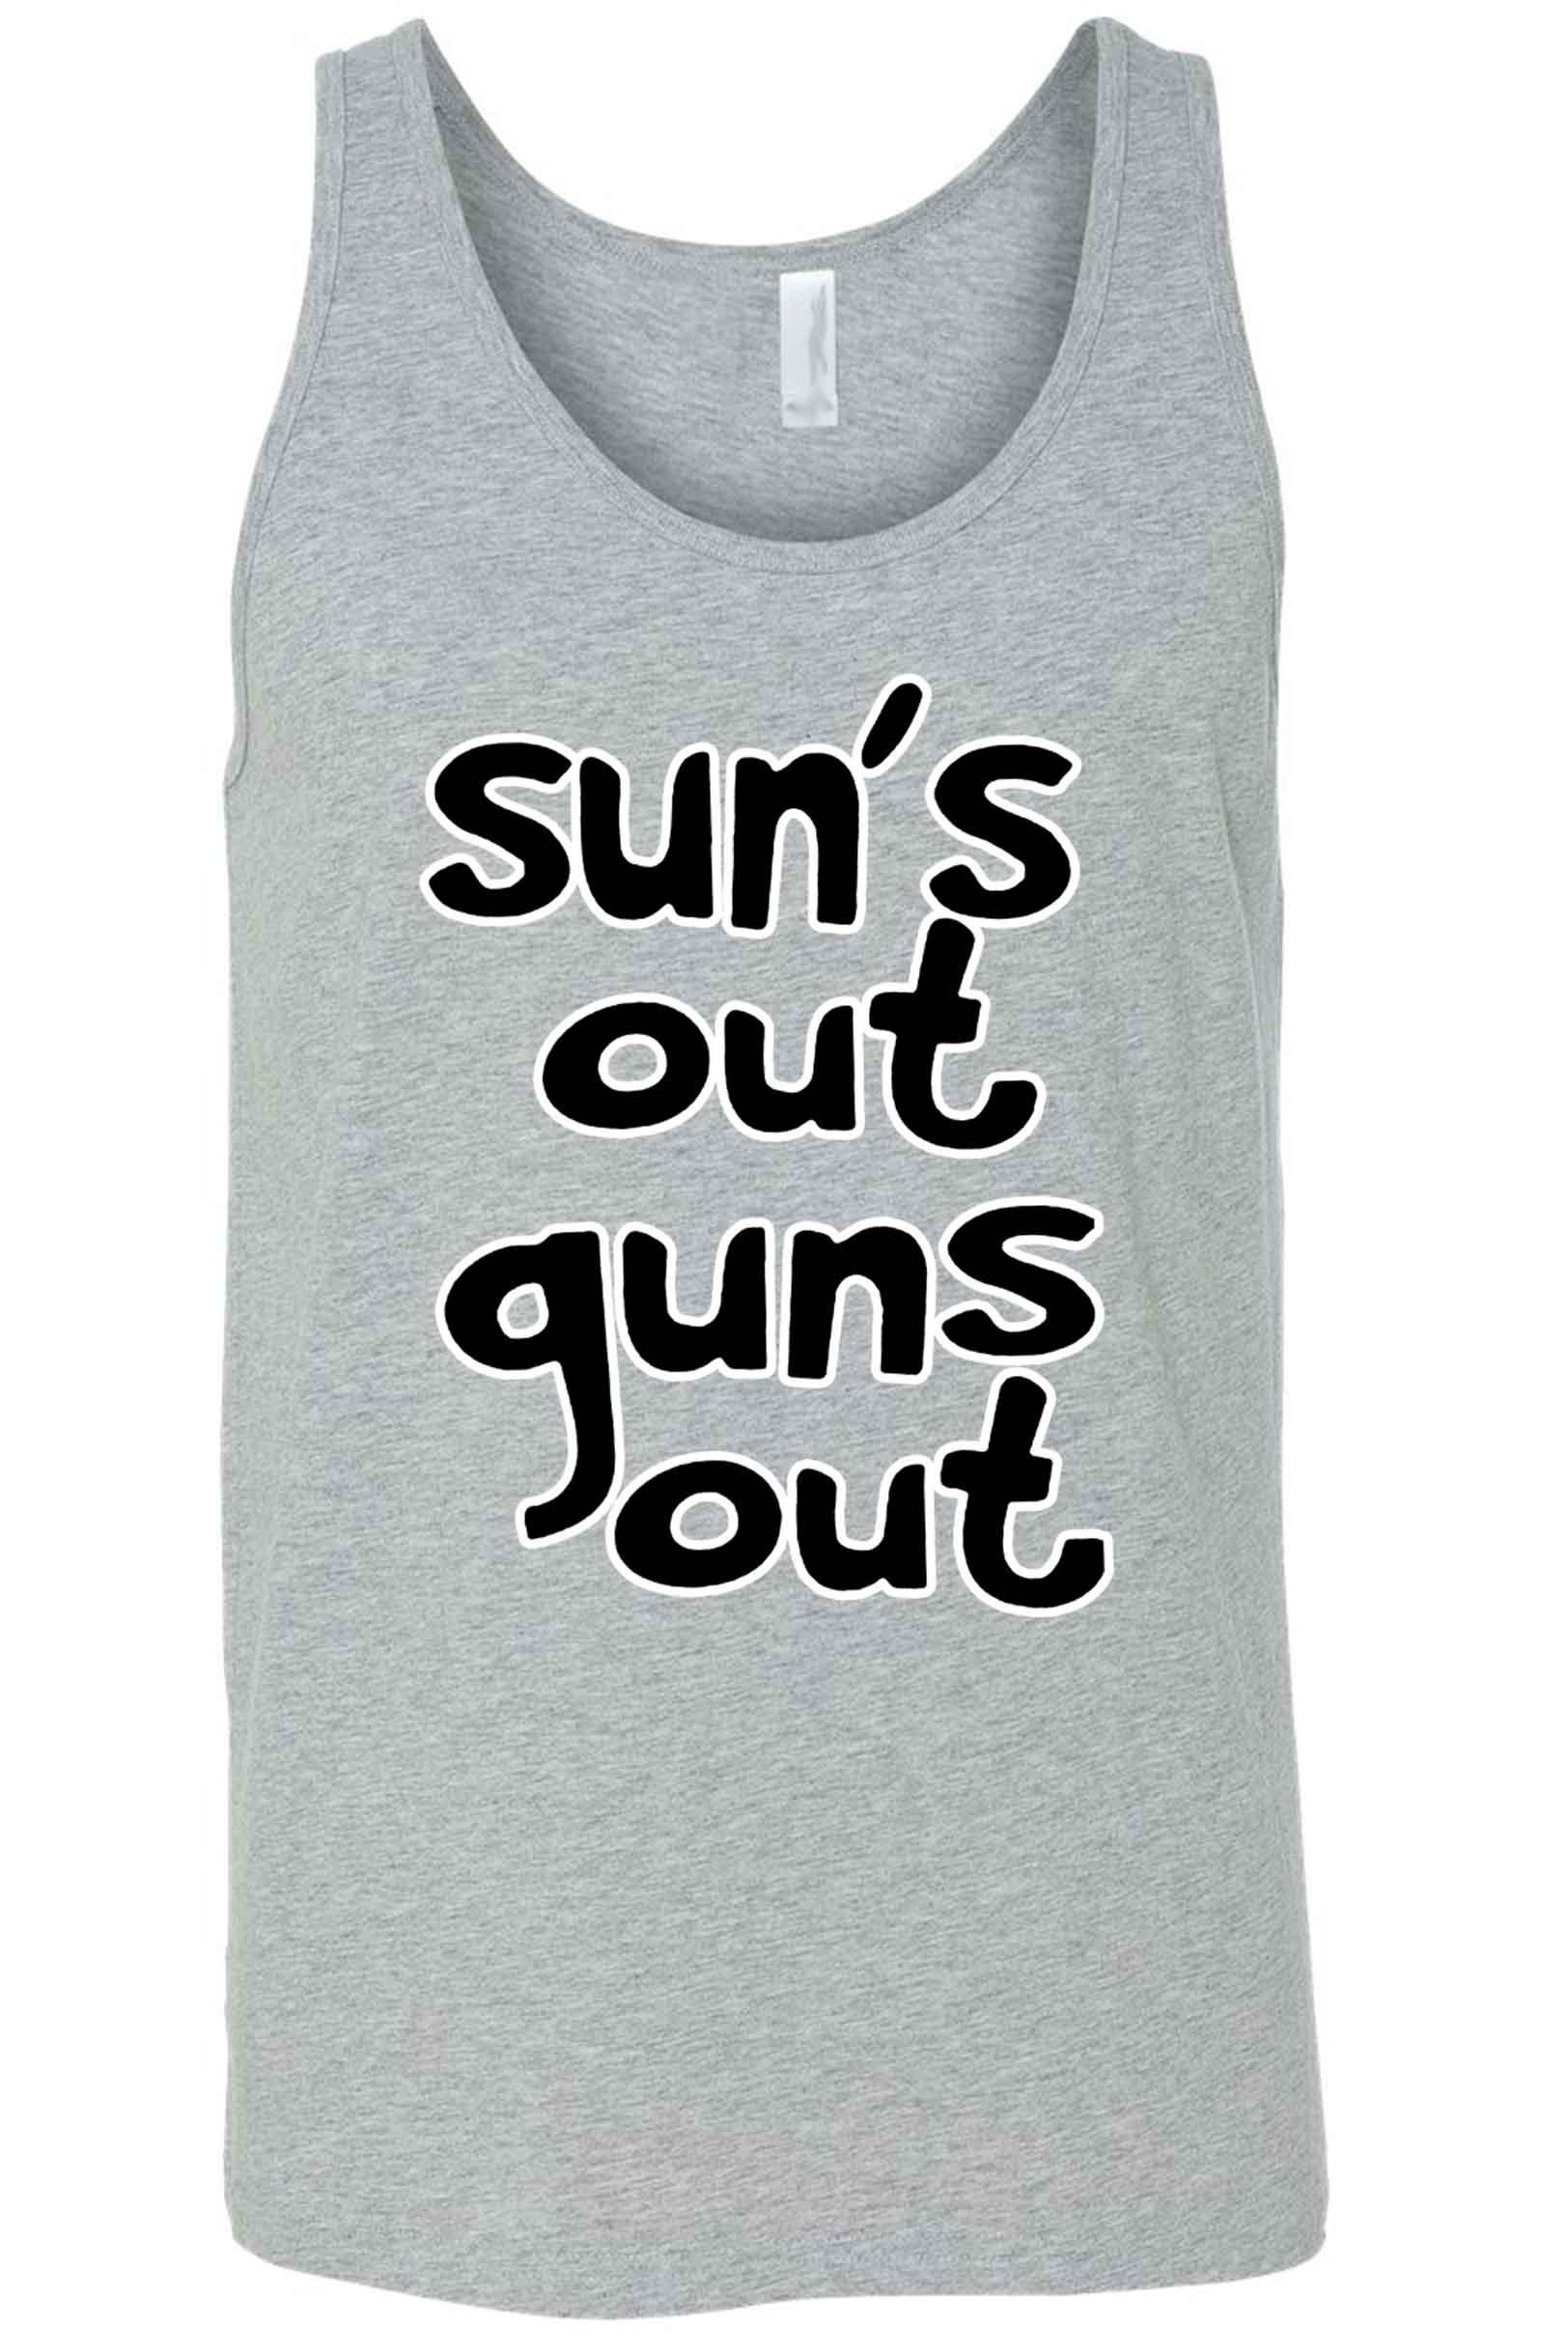 Men's Sun's Out Guns Out Tank Top Shirt